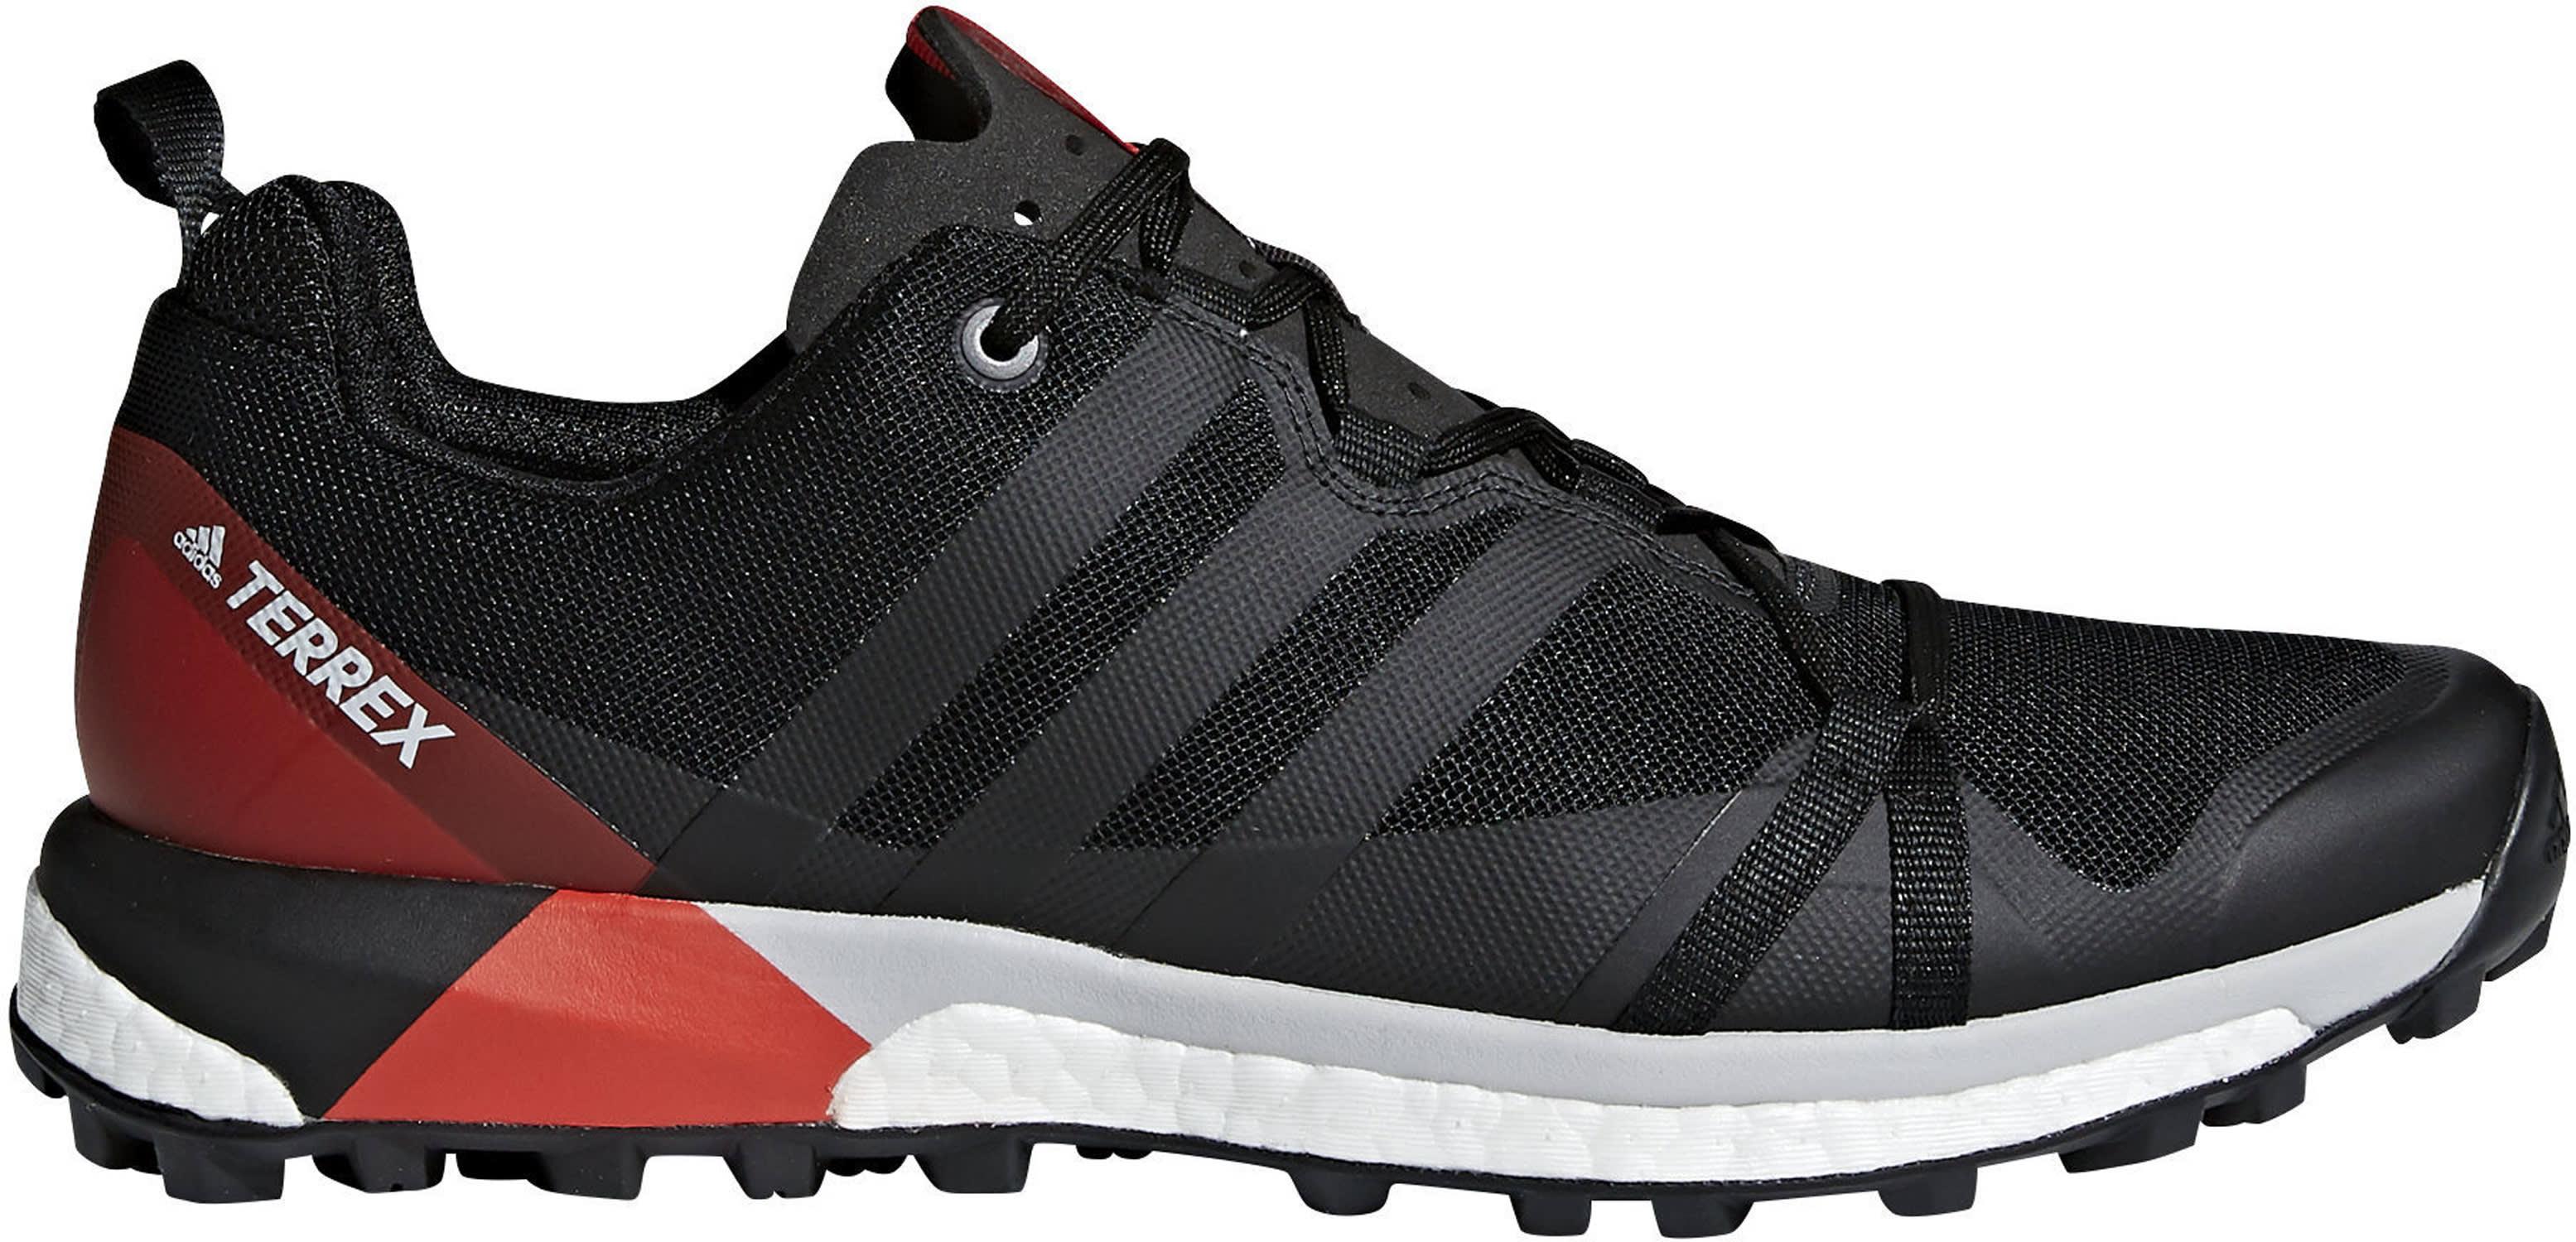 Adidas Terrex Agravic Shoes - thumbnail 1 0dfc56766